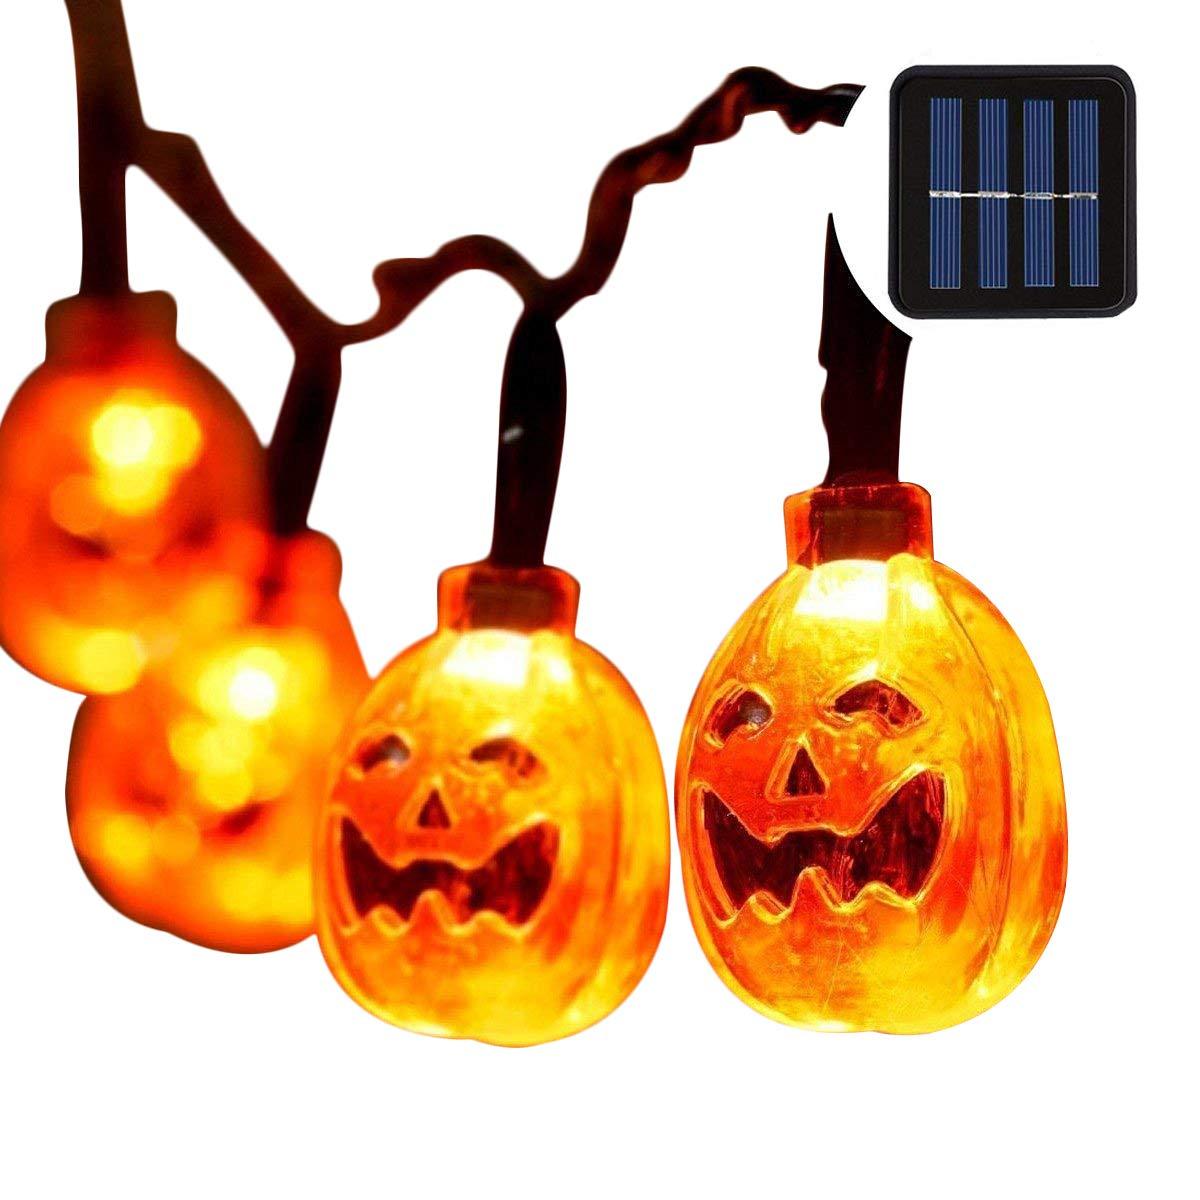 Pumpkin String Lights Outdoor Halloween Lights with 30 LEDs Pumpkin Solar Power String Lights for Outdoor,Home,Patio,Garden Deco (20 ft 30 LEDs Warm White)